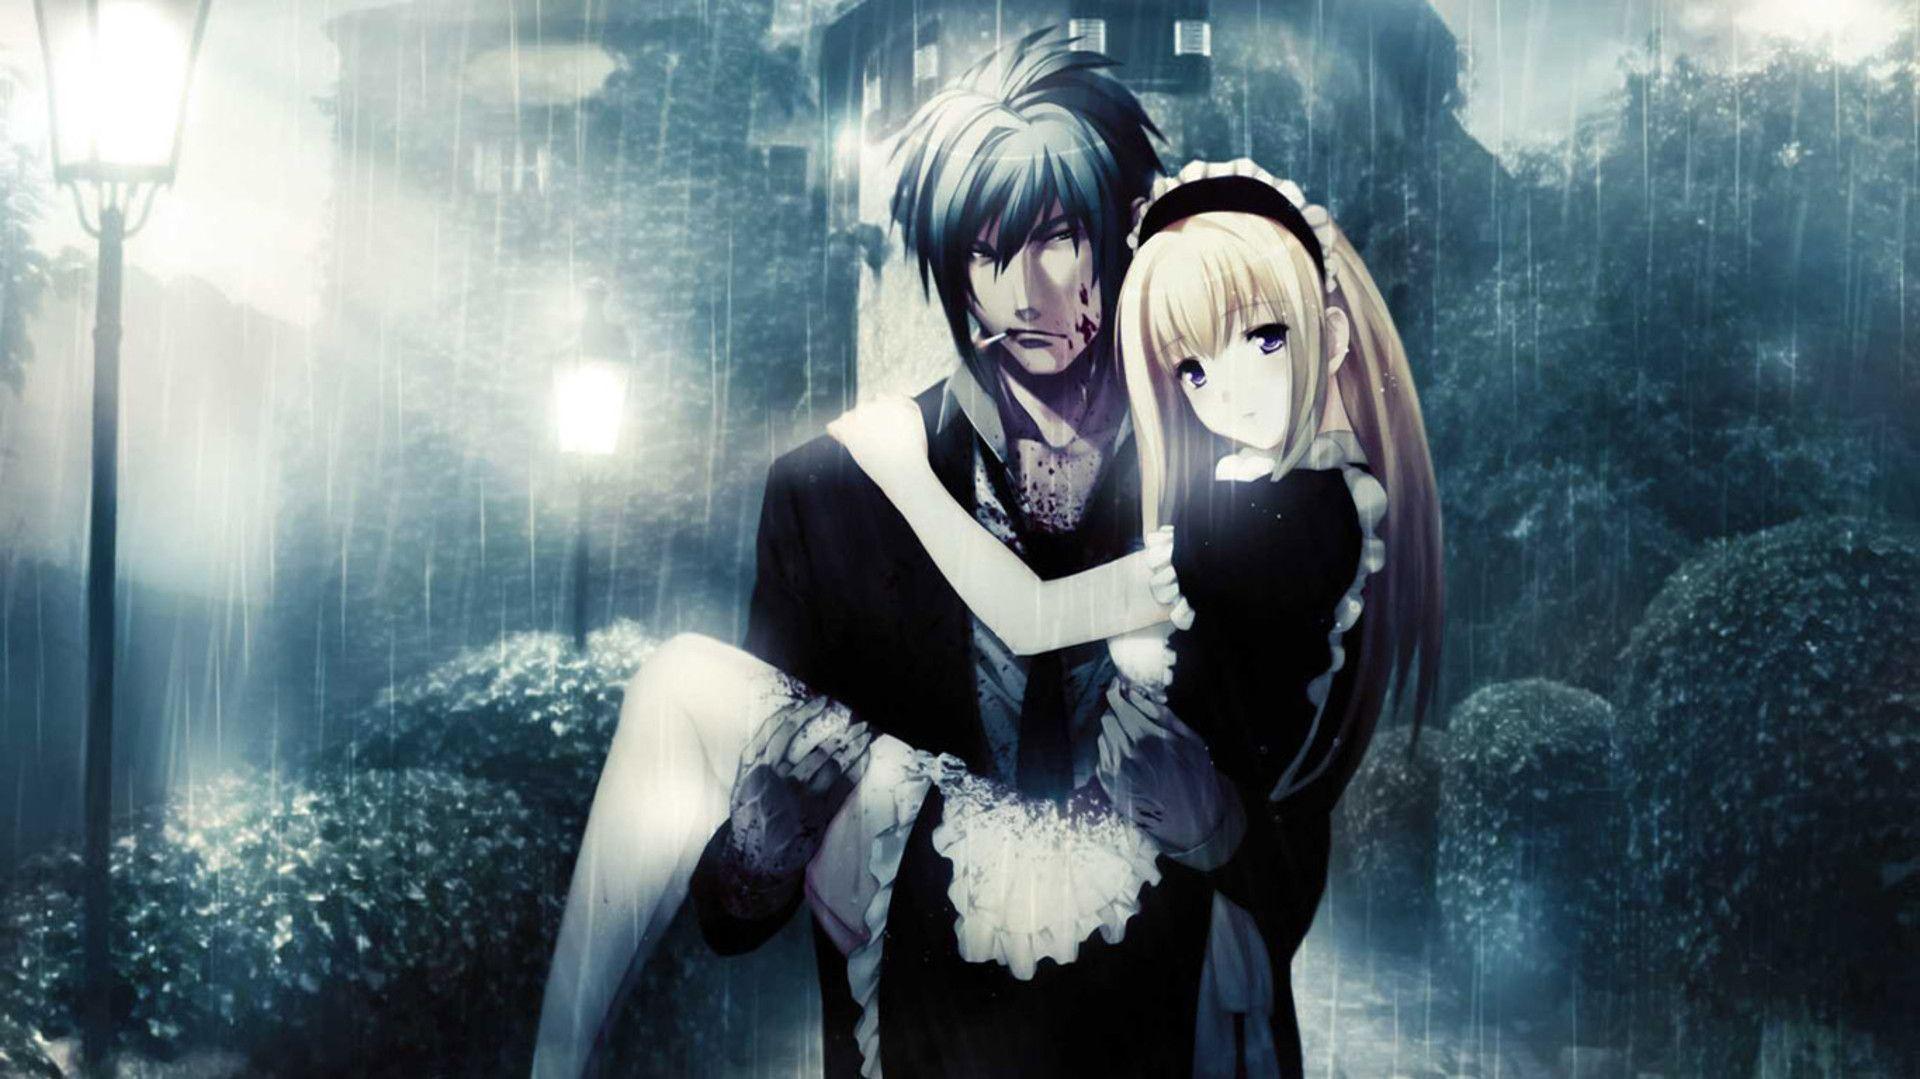 Romantic Anime Wallpaper Couples